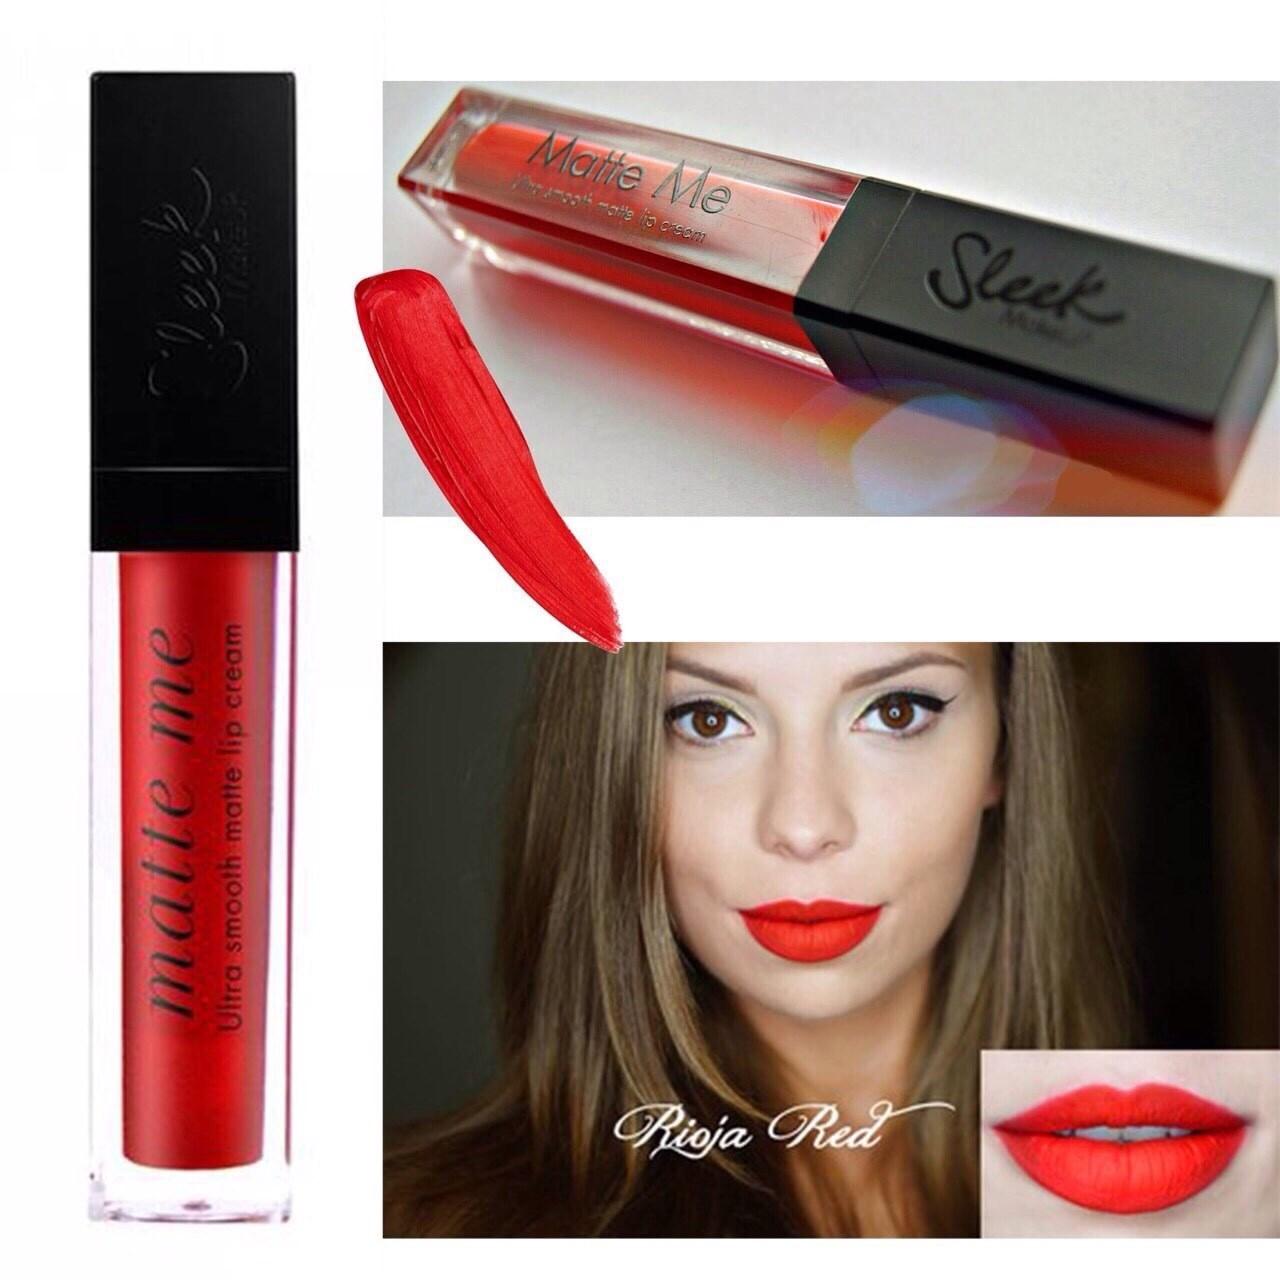 Sleek Matte Me Ultra Smooth Matte Lip Cream #433 Rioja Red